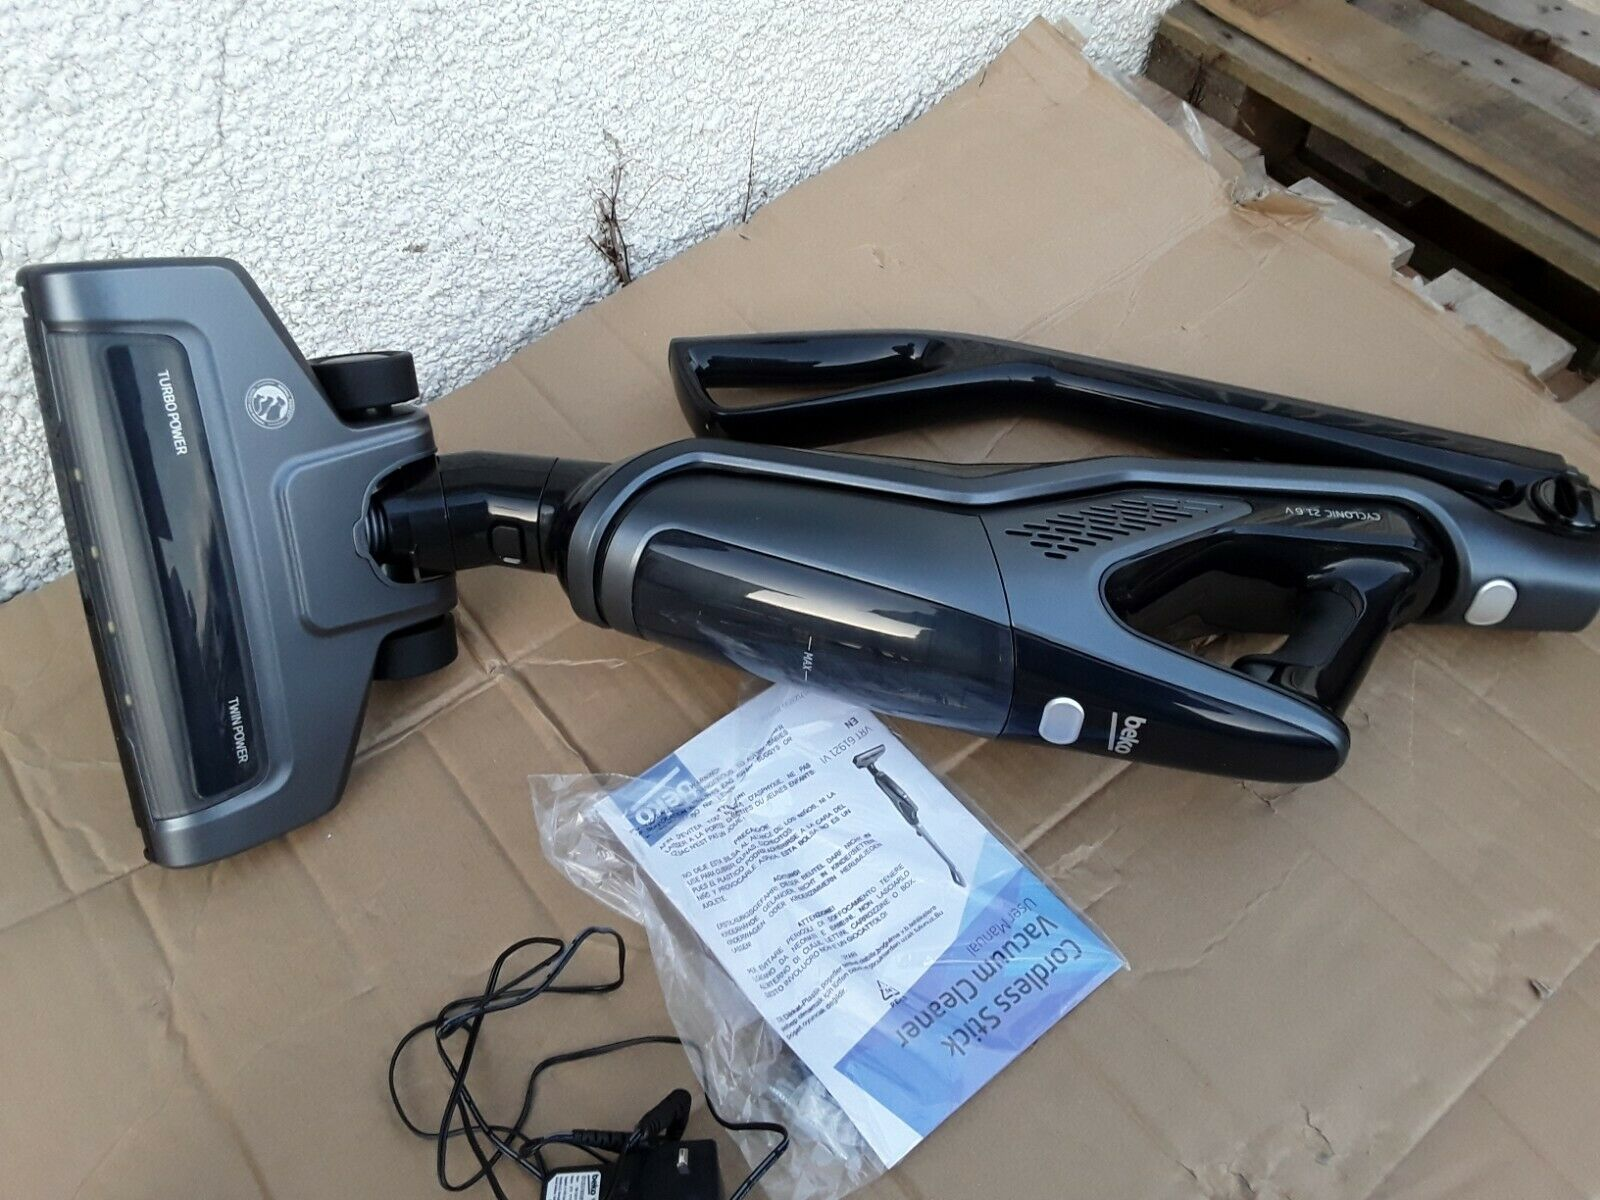 Beko Upright Cordless 21V Vacuum